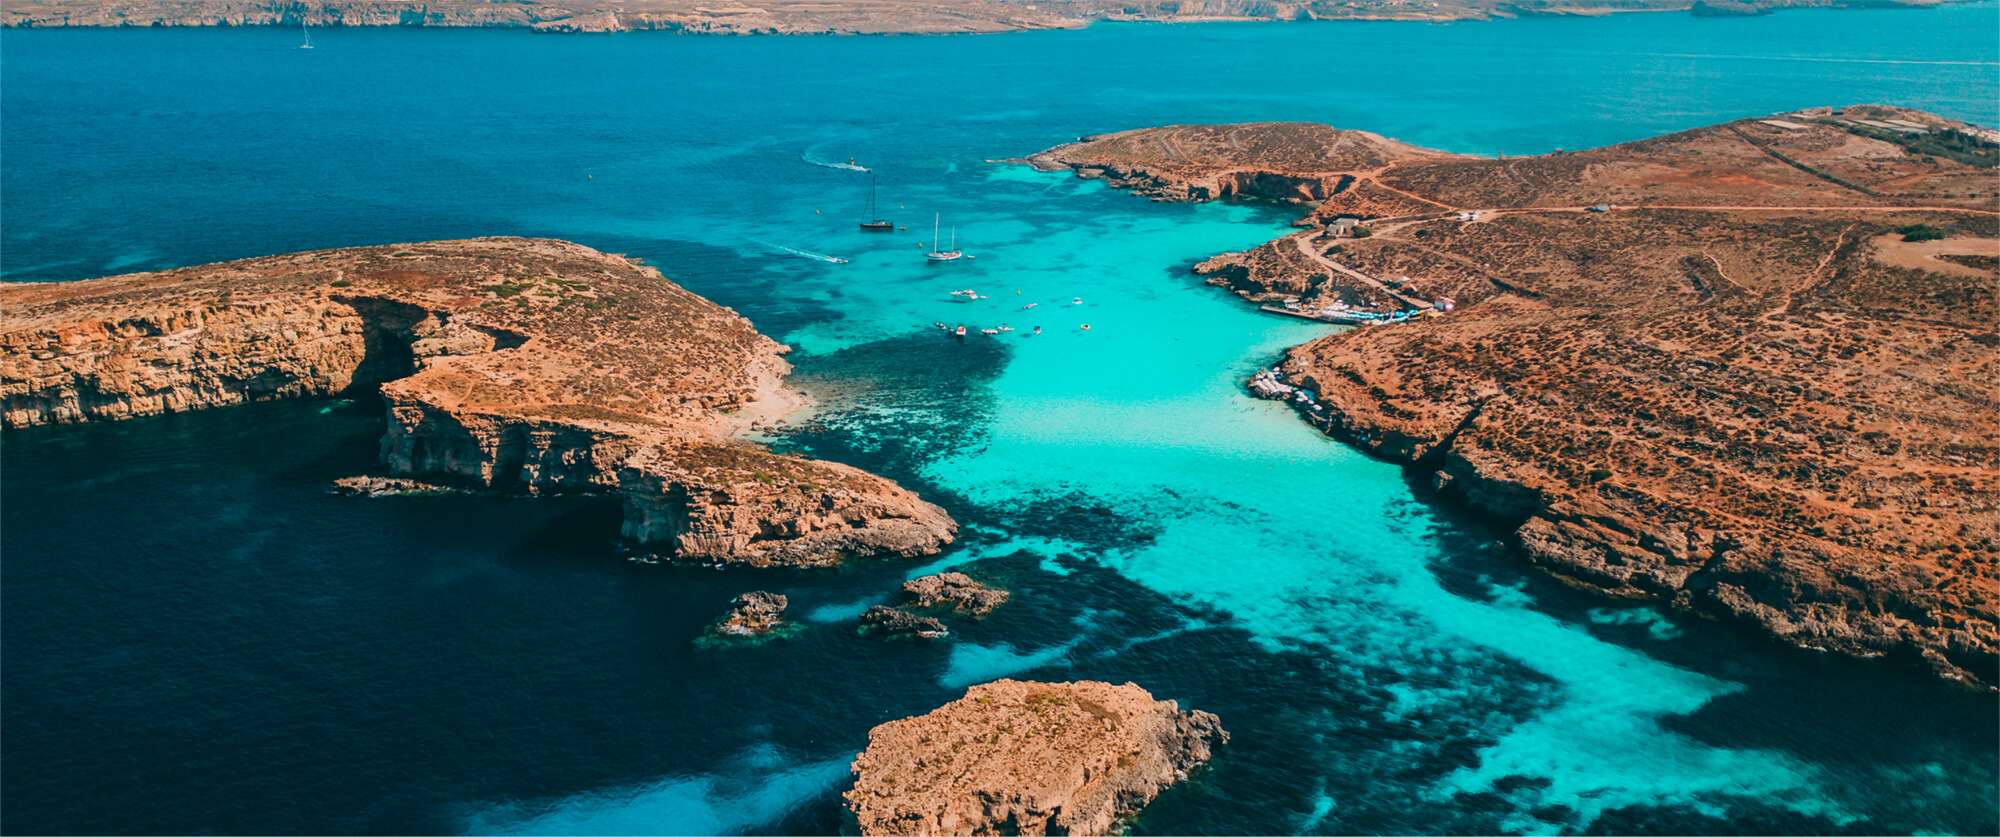 Stunning Blue Lagoon, Comino Island